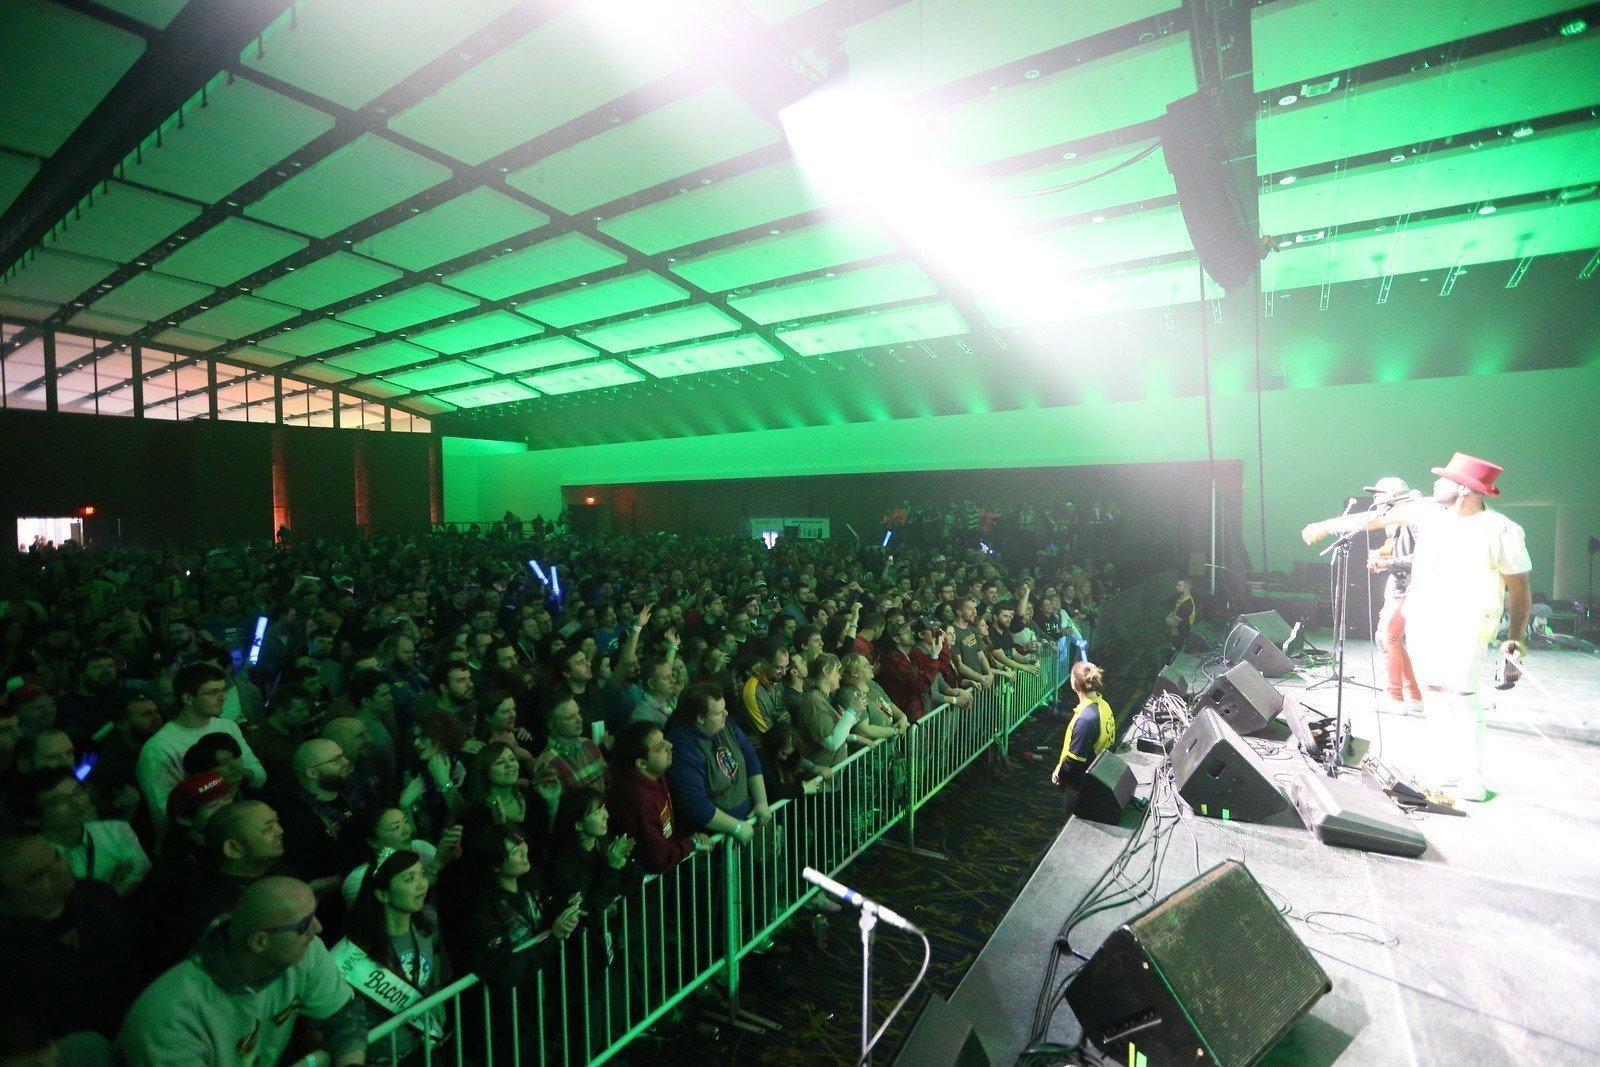 B2wins Festival entertainment Brazilian 2wins open for Smashmouth